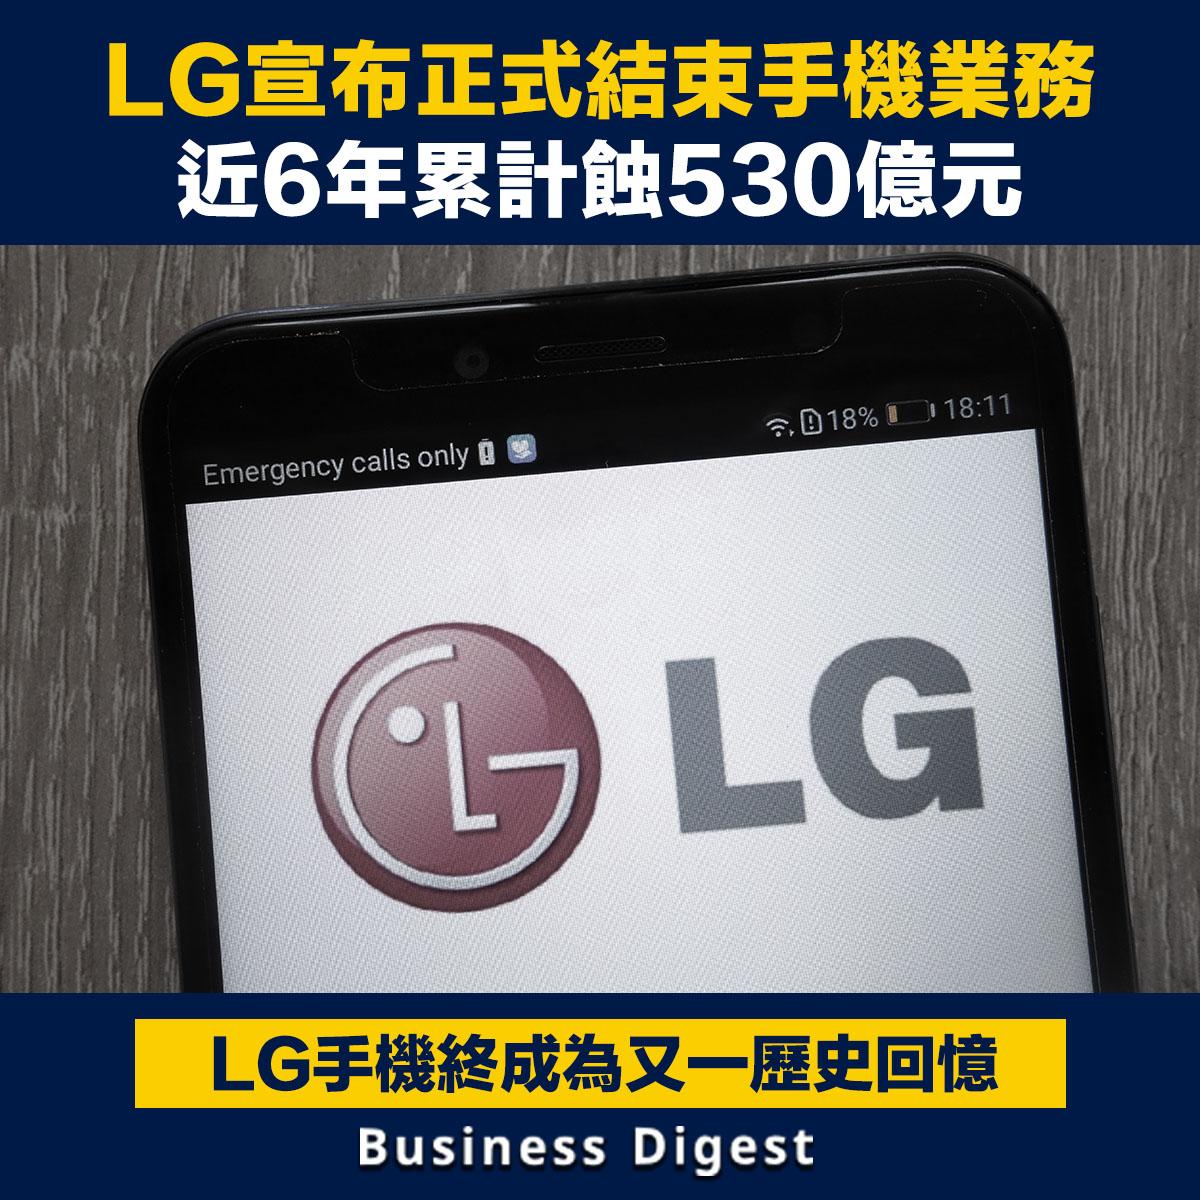 LG電子宣布7月31日起停止生產和出售手機